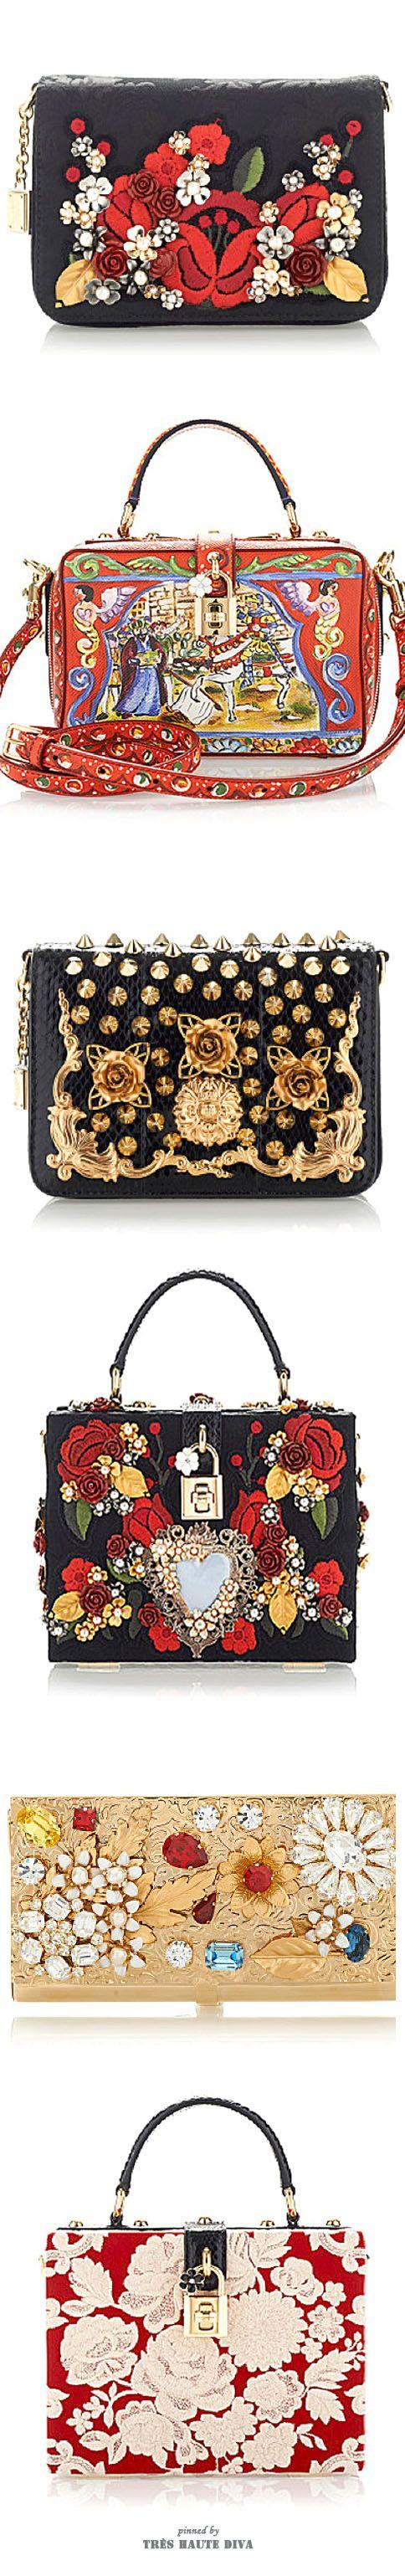 Dolce & Gabbana  Spring Summer 2015 ♔ Tres Haute Diva